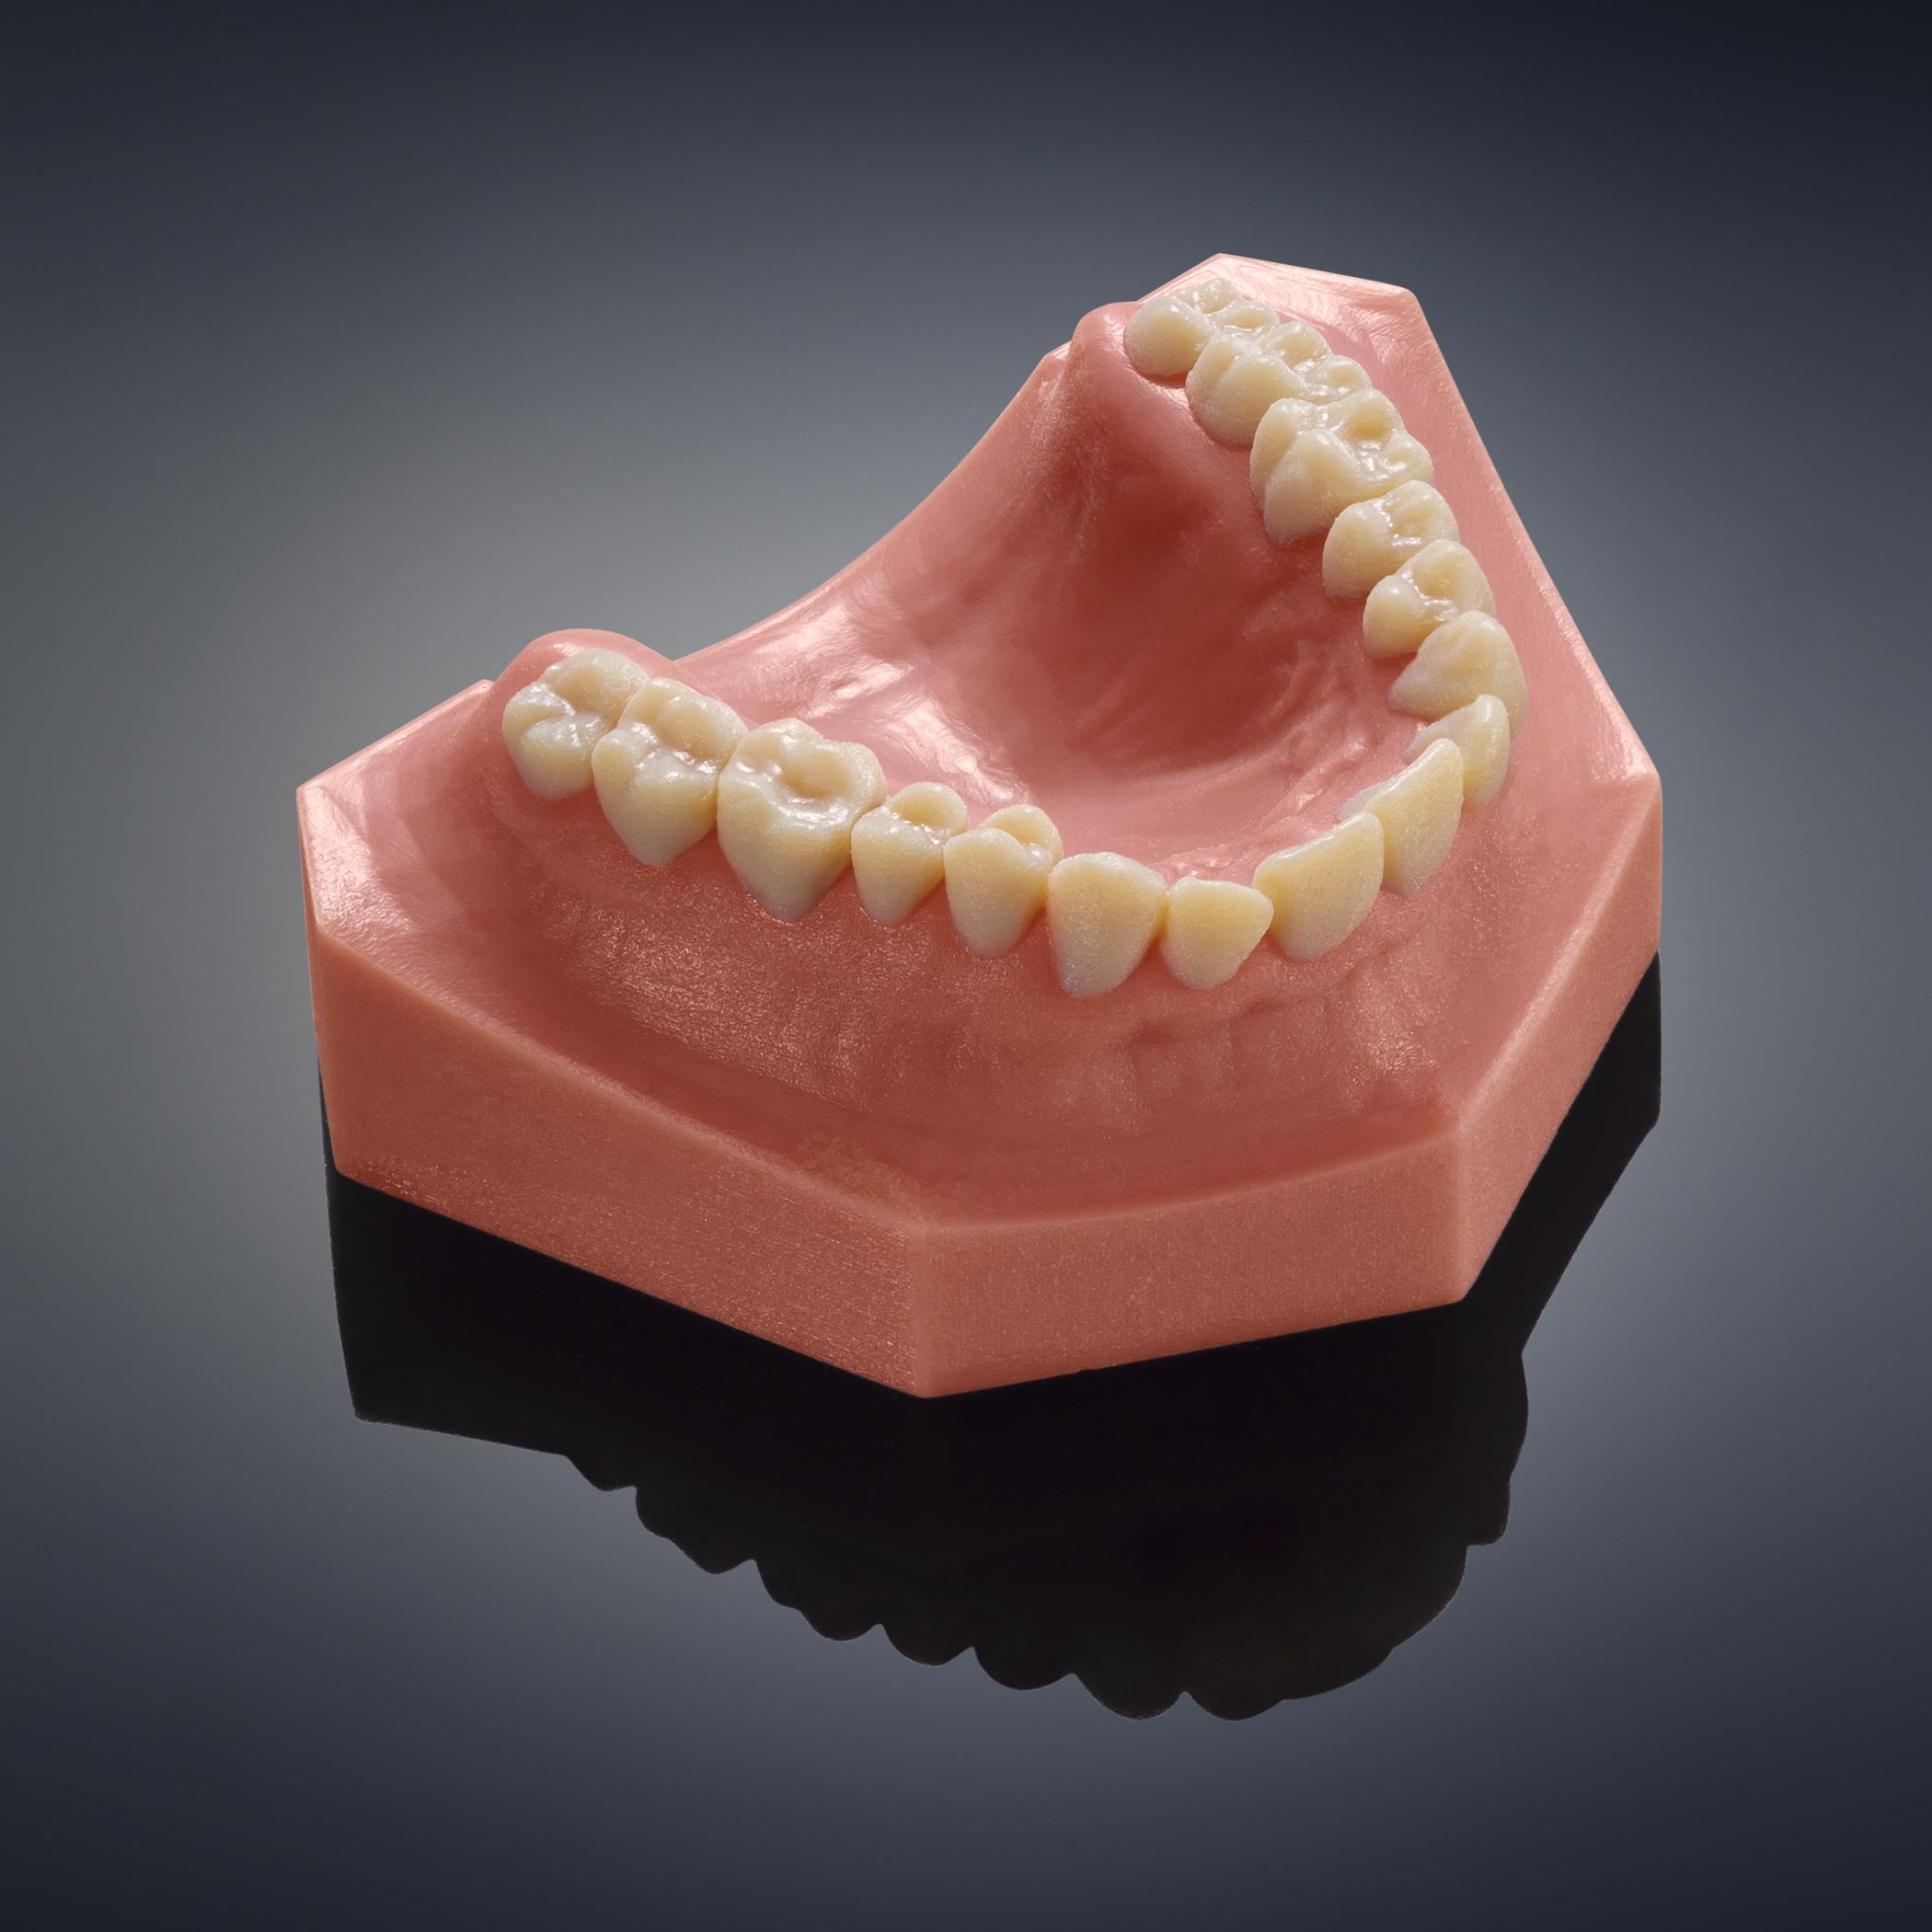 Objet260 dental2 3d printing 3d druck - Stratasys stellt Objet260 Dental Selection für Digitale Zahnmedizin vor